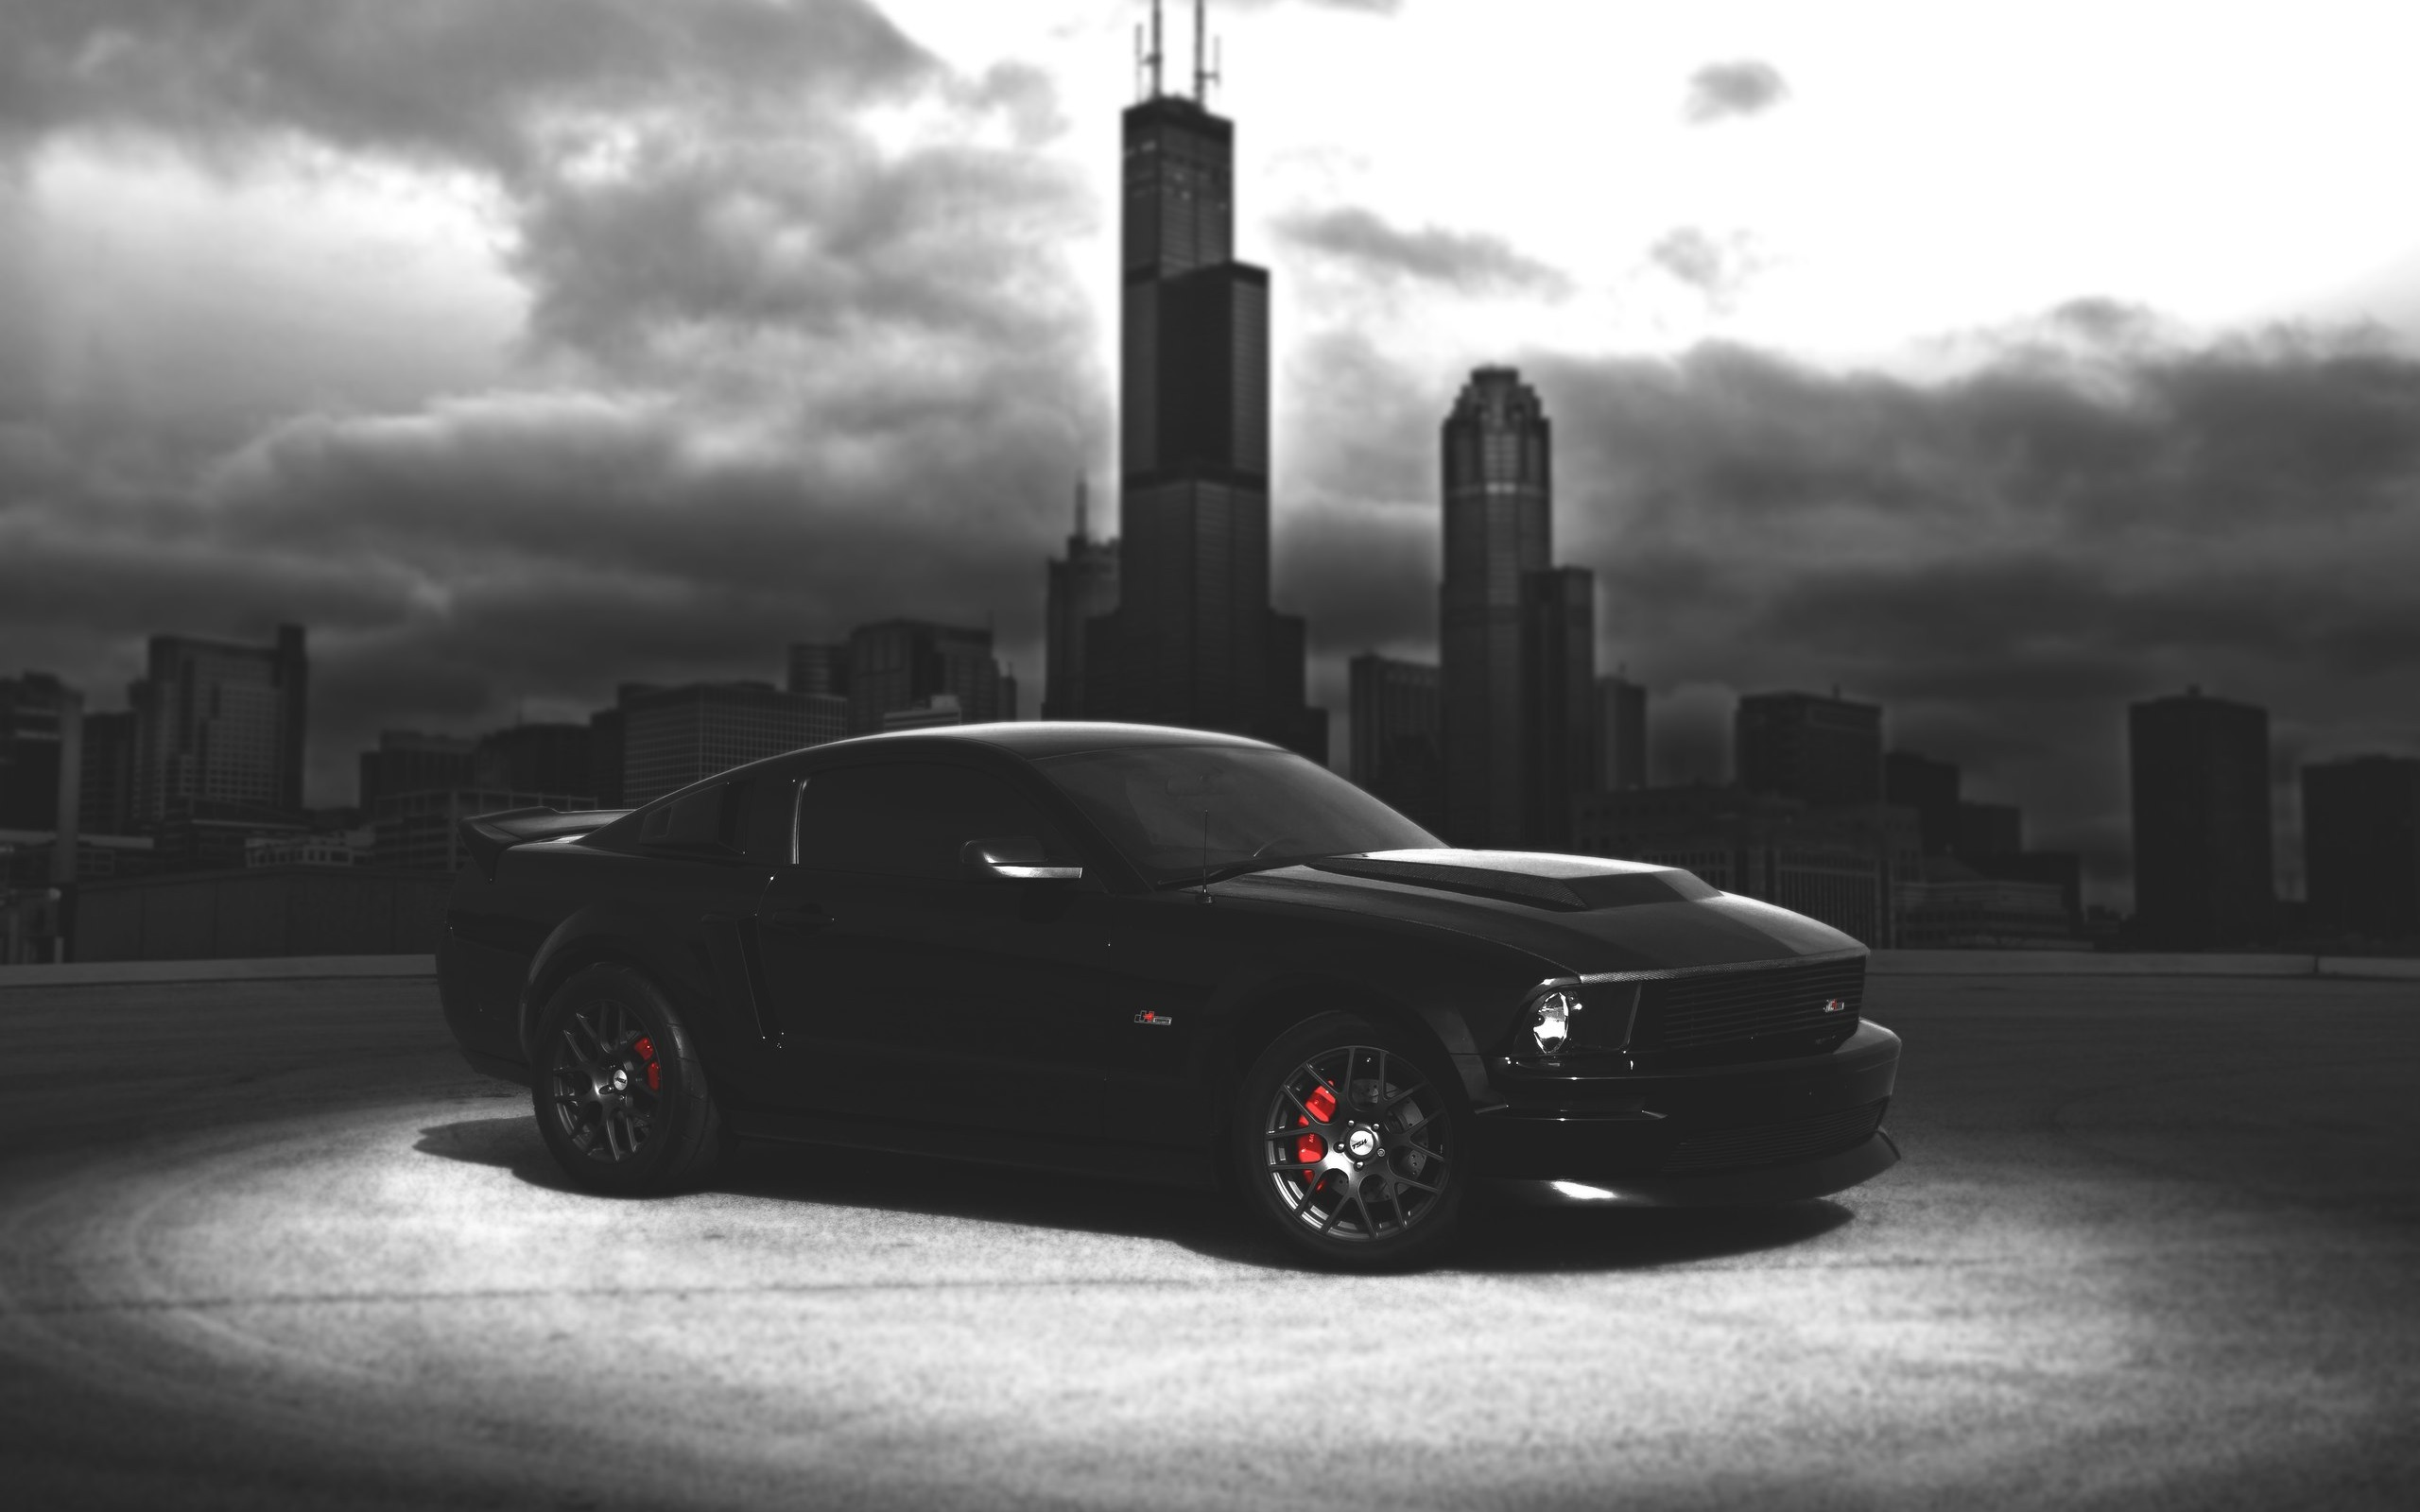 Wallpaper Ford Mustang Black Car Dark Night City 2560x1600 Hd